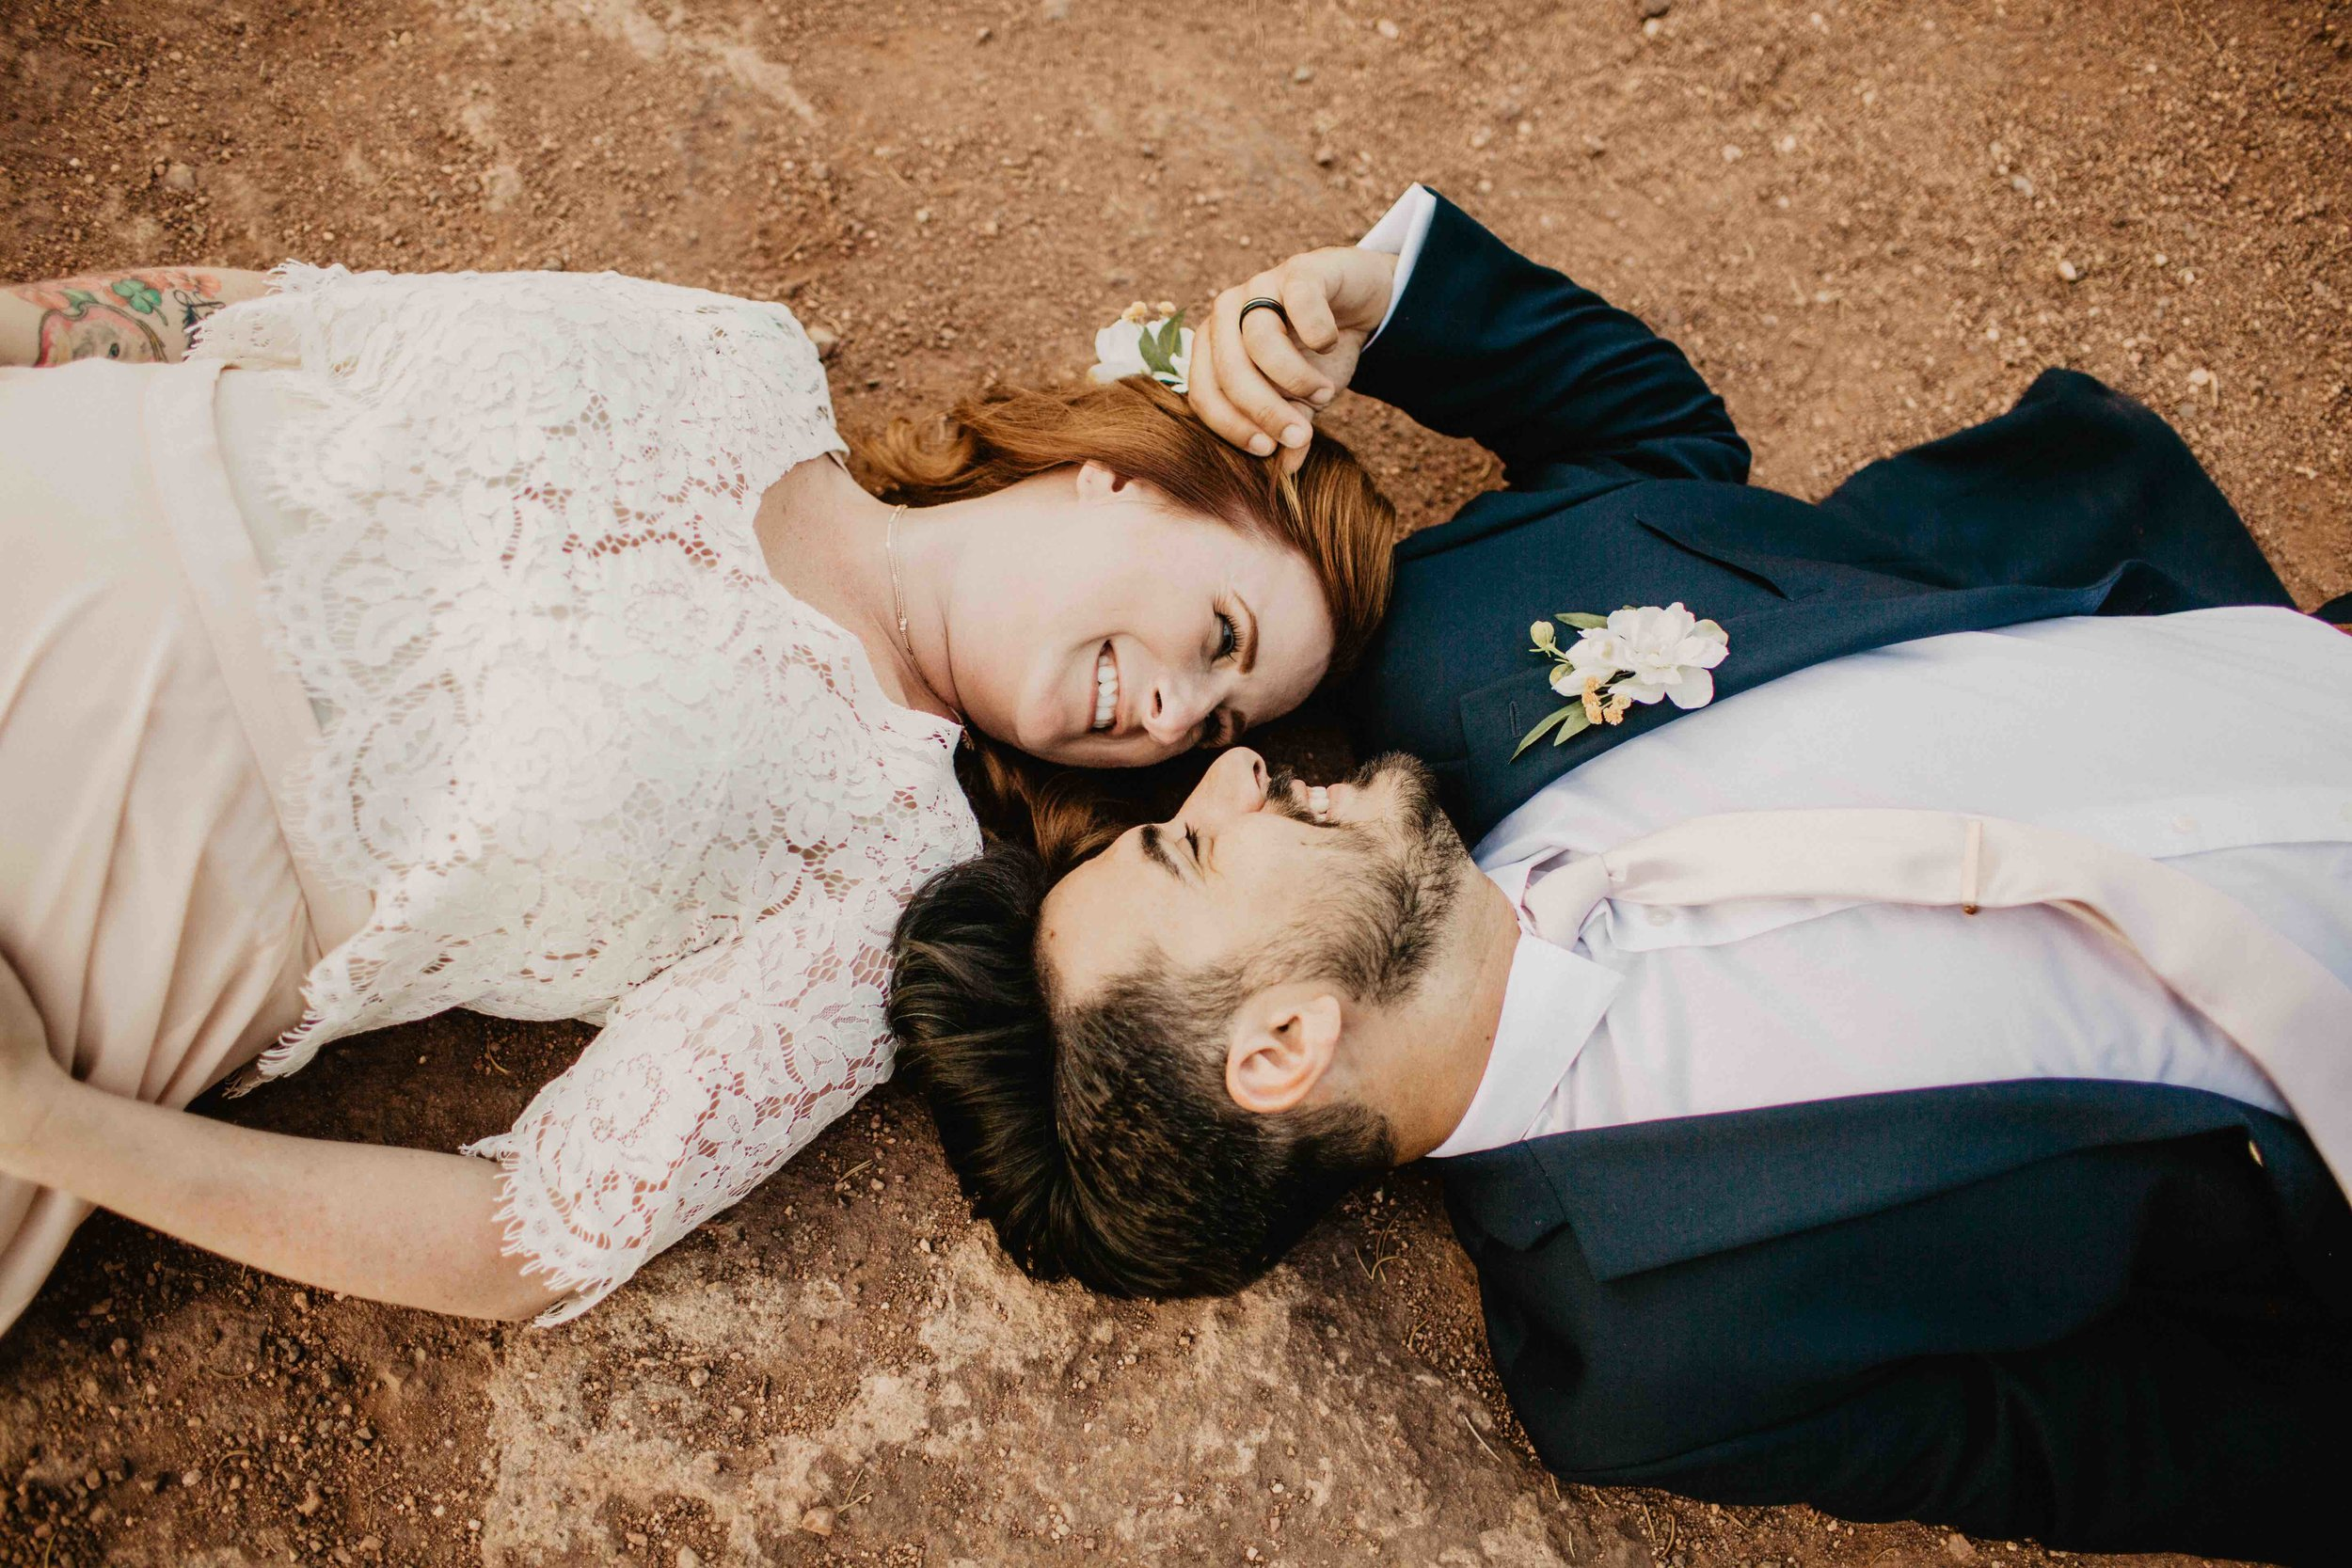 -colorado-wedding-photographer-denver-springs-vail-607A4335.jpeg